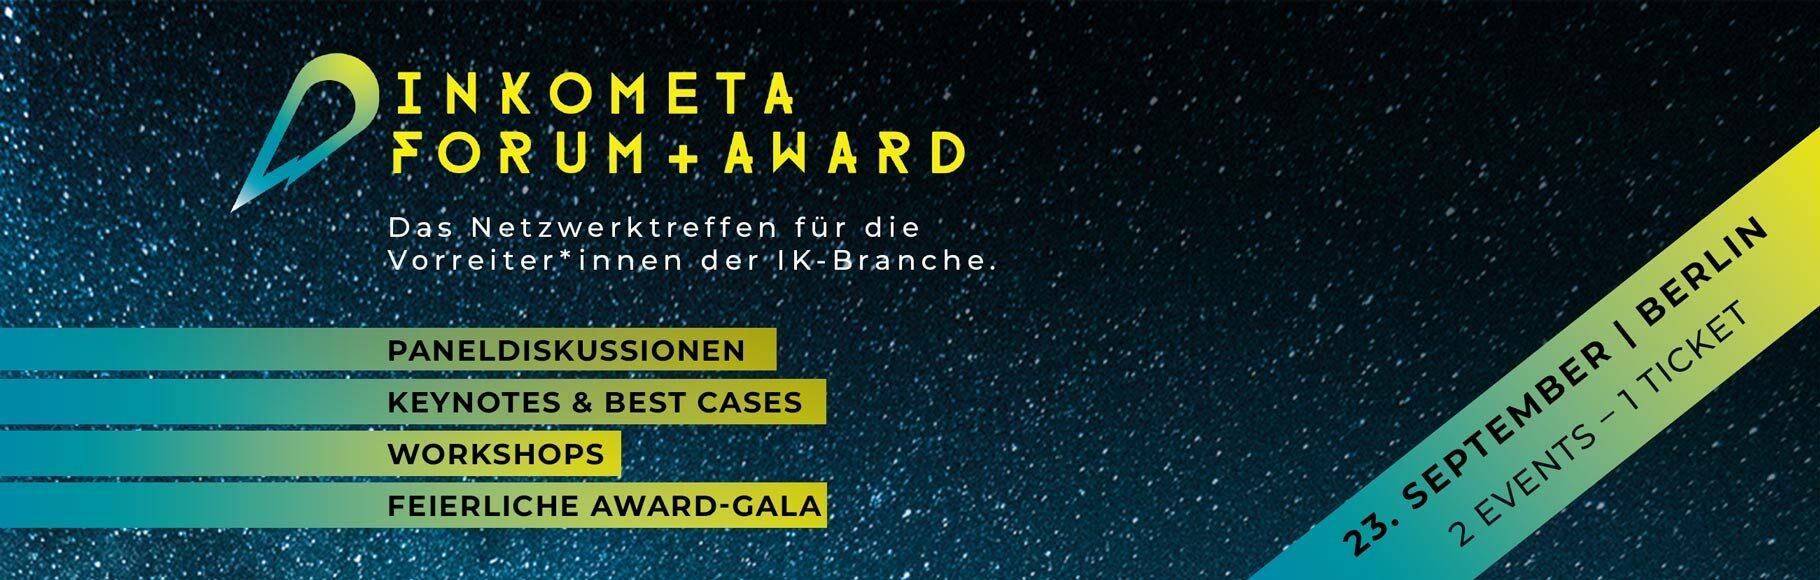 INKOMETA Forum und Award